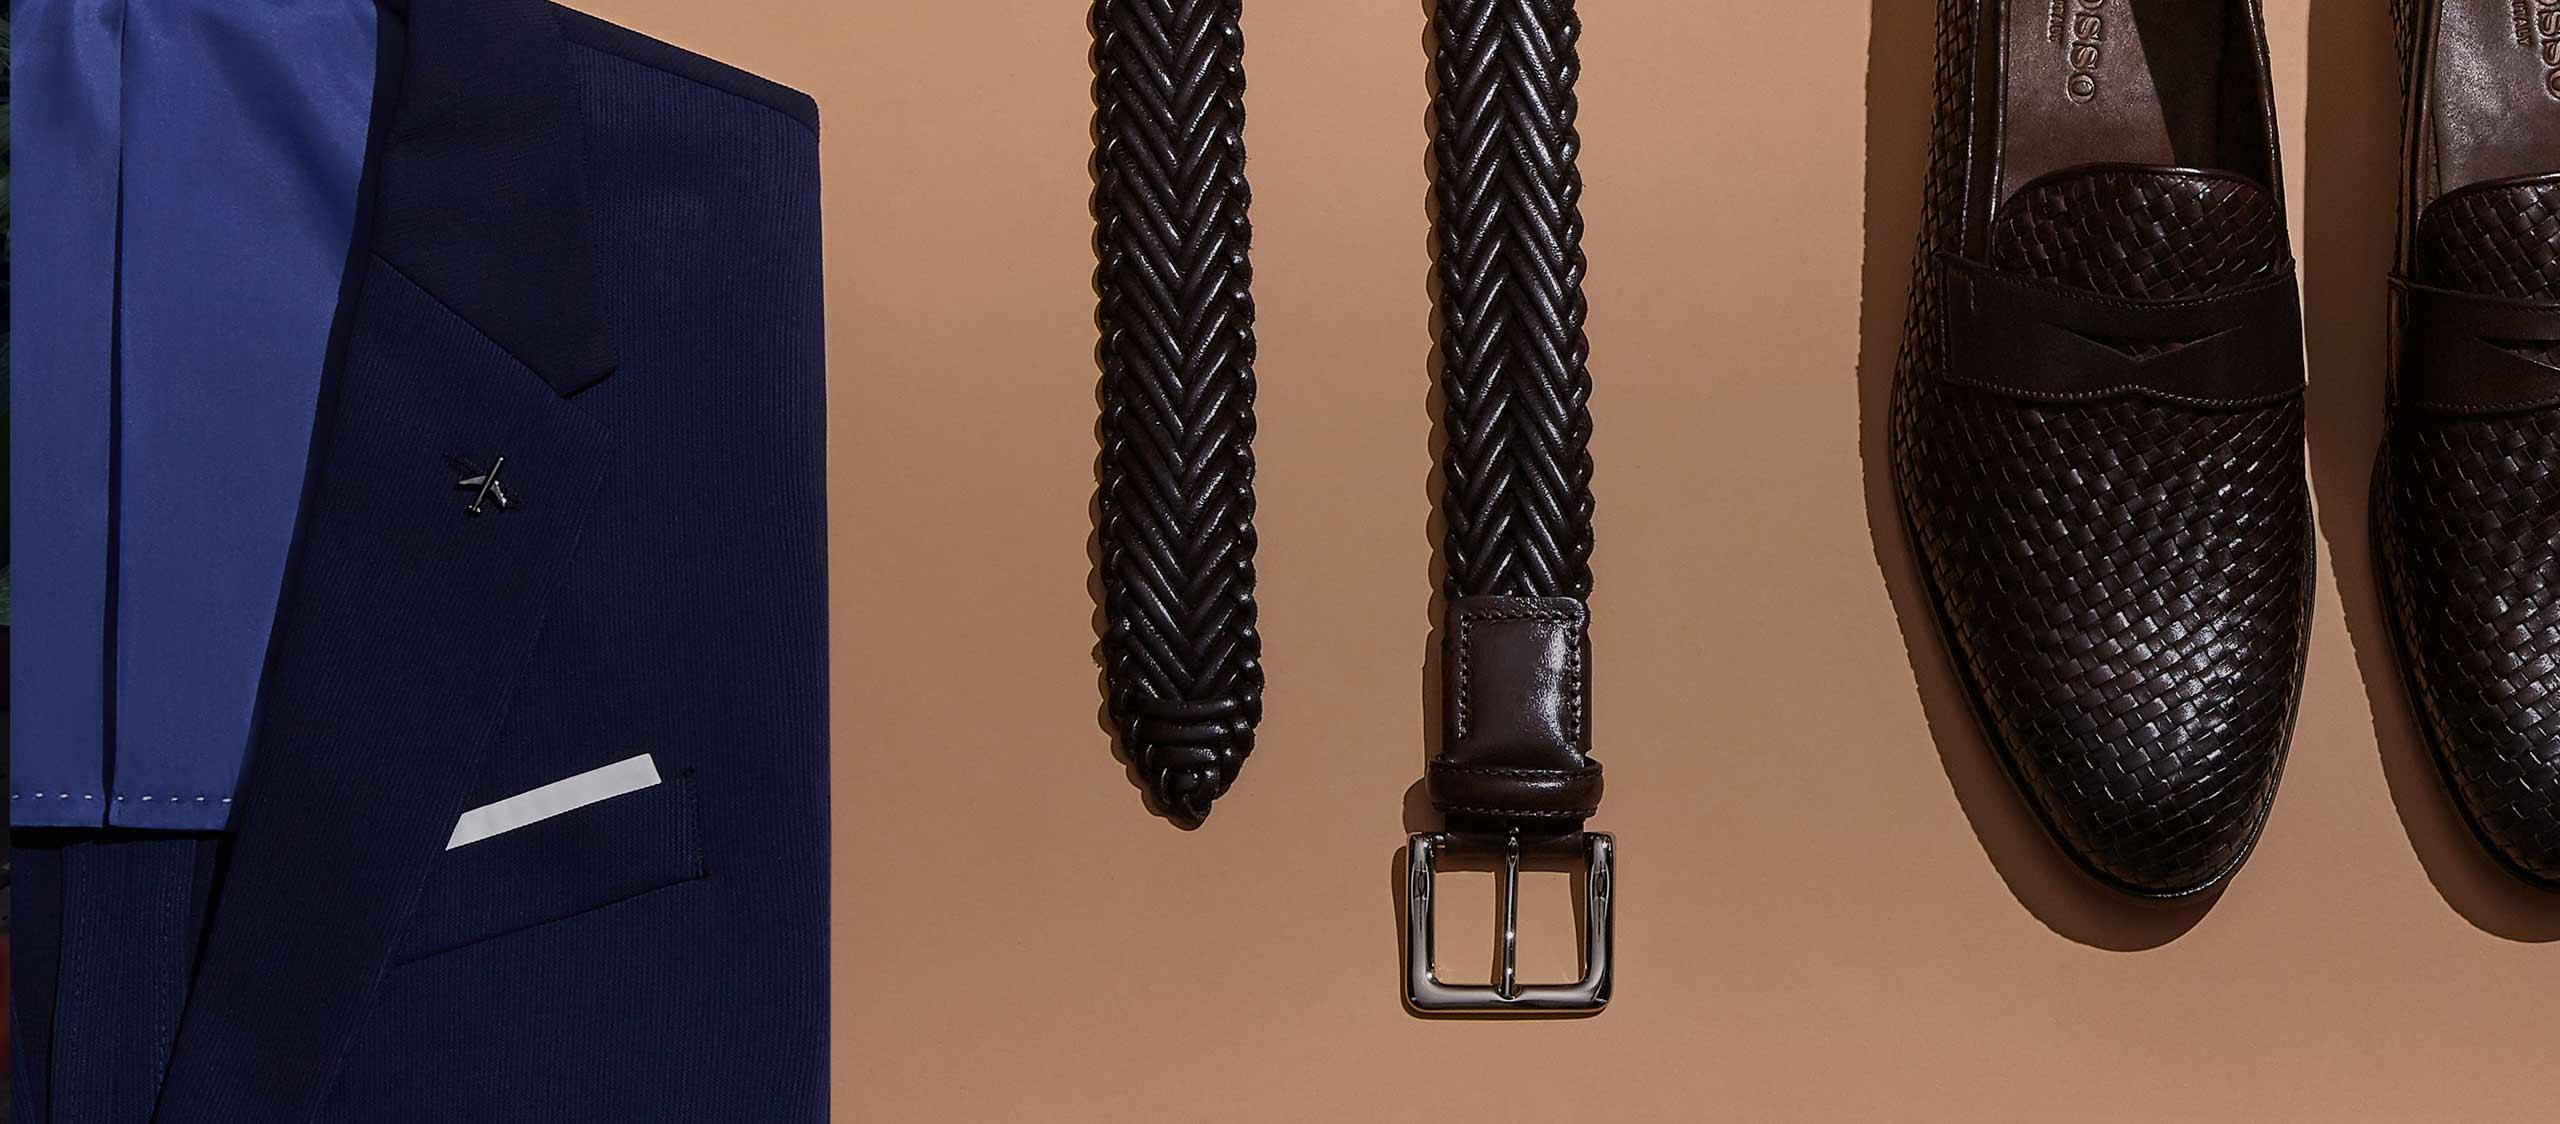 Belts matching Shoes